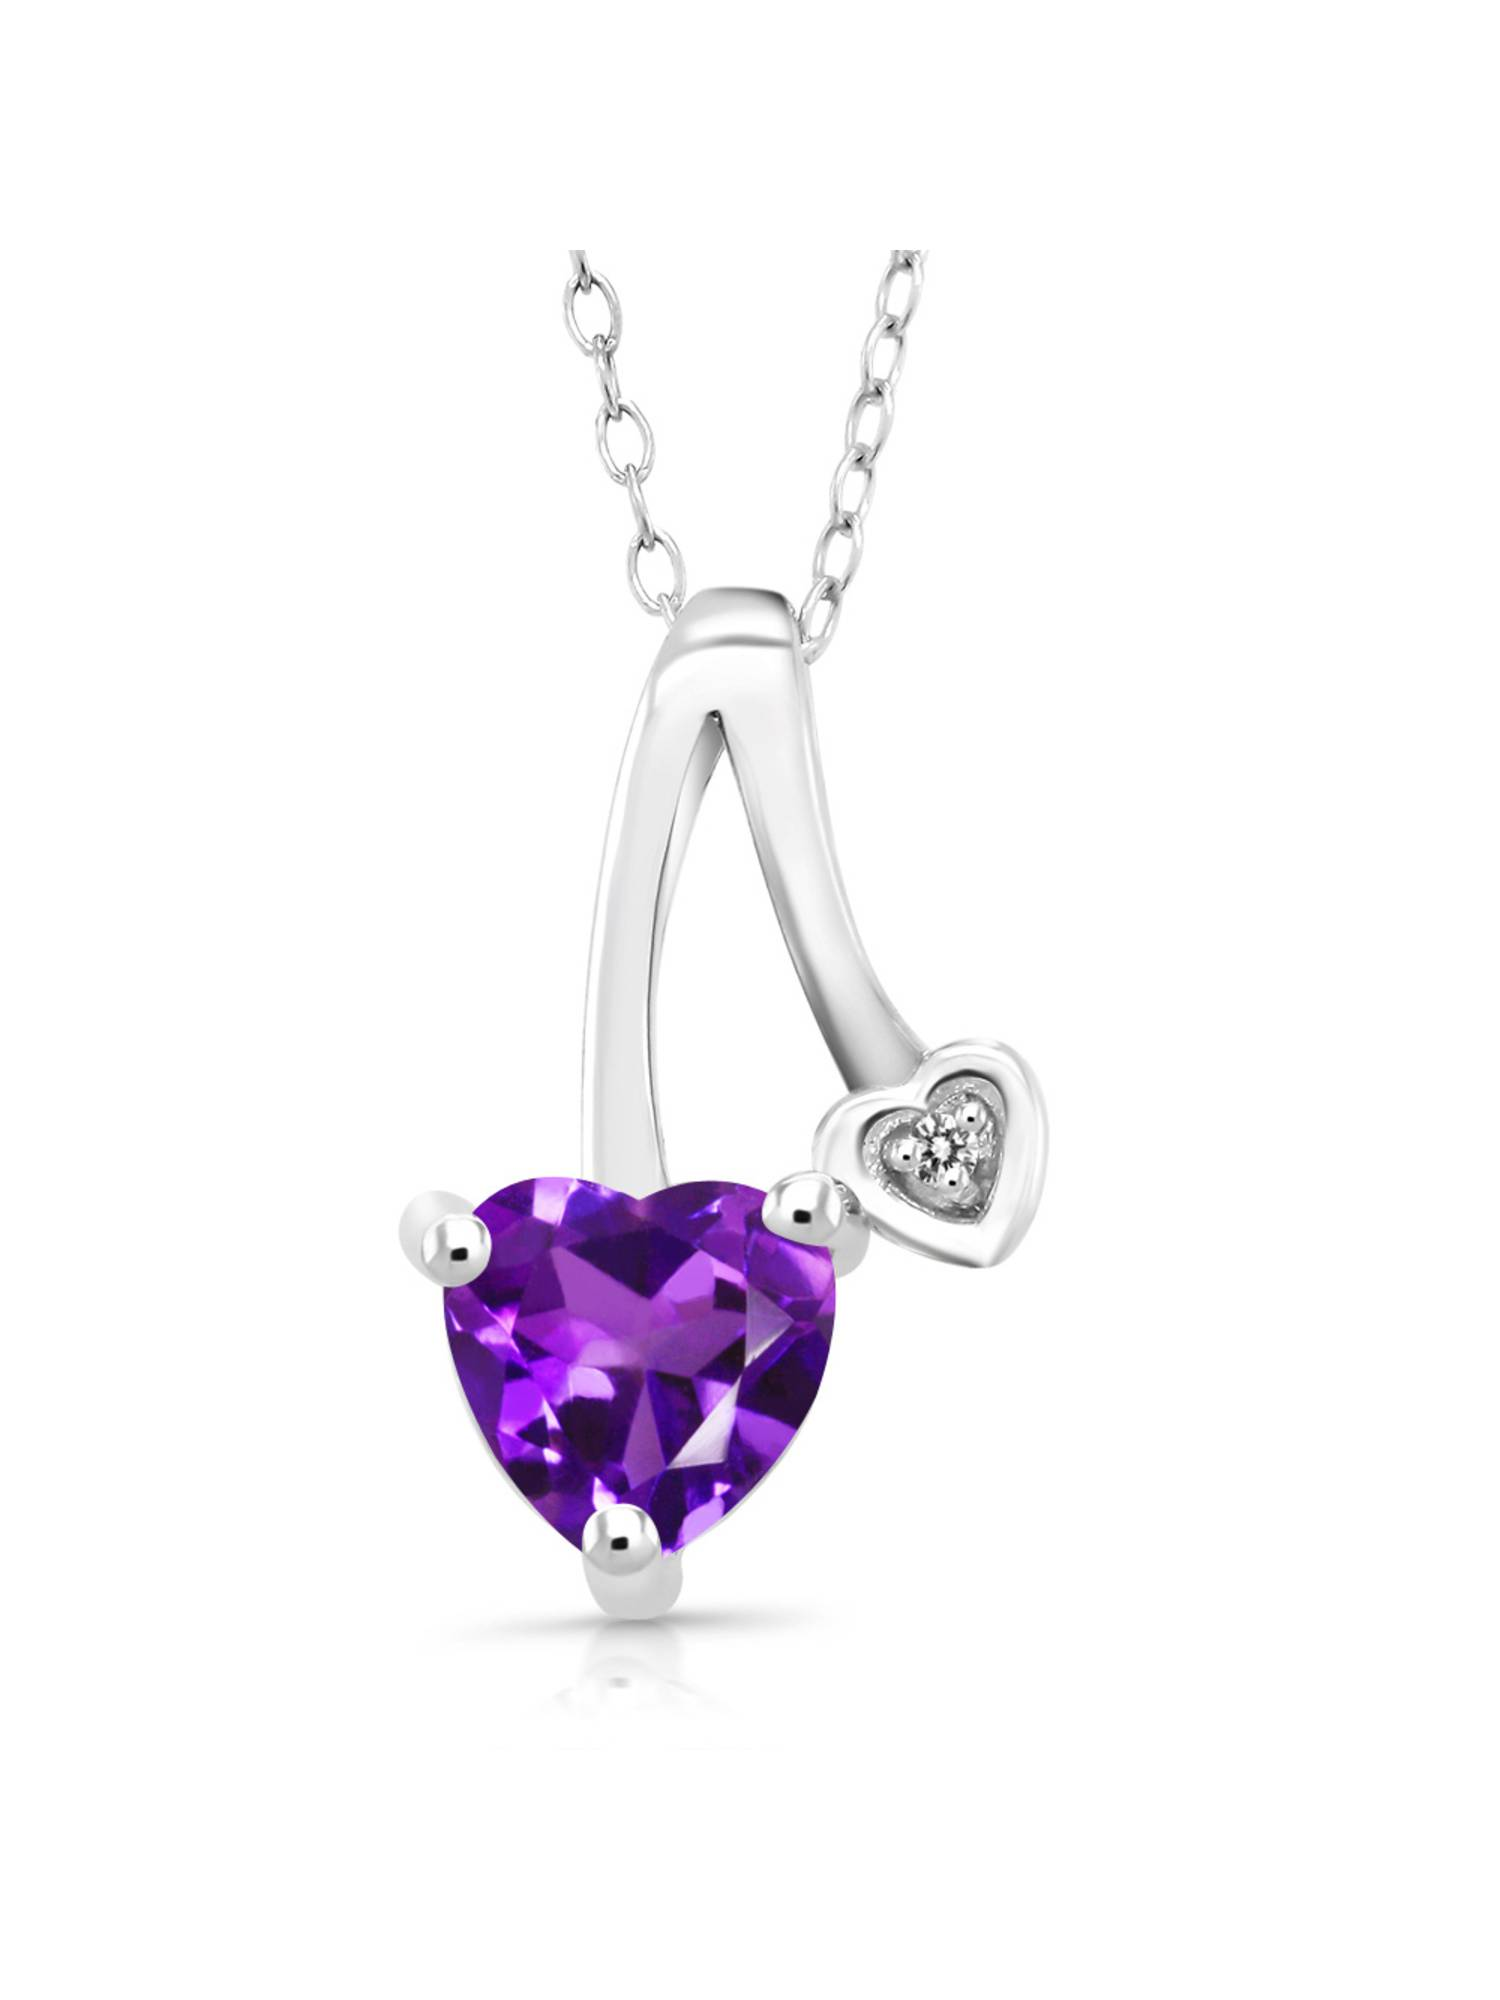 0.75 Ct Heart Shape Purple Amethyst White Diamond 925 Sterling Silver Pendant by